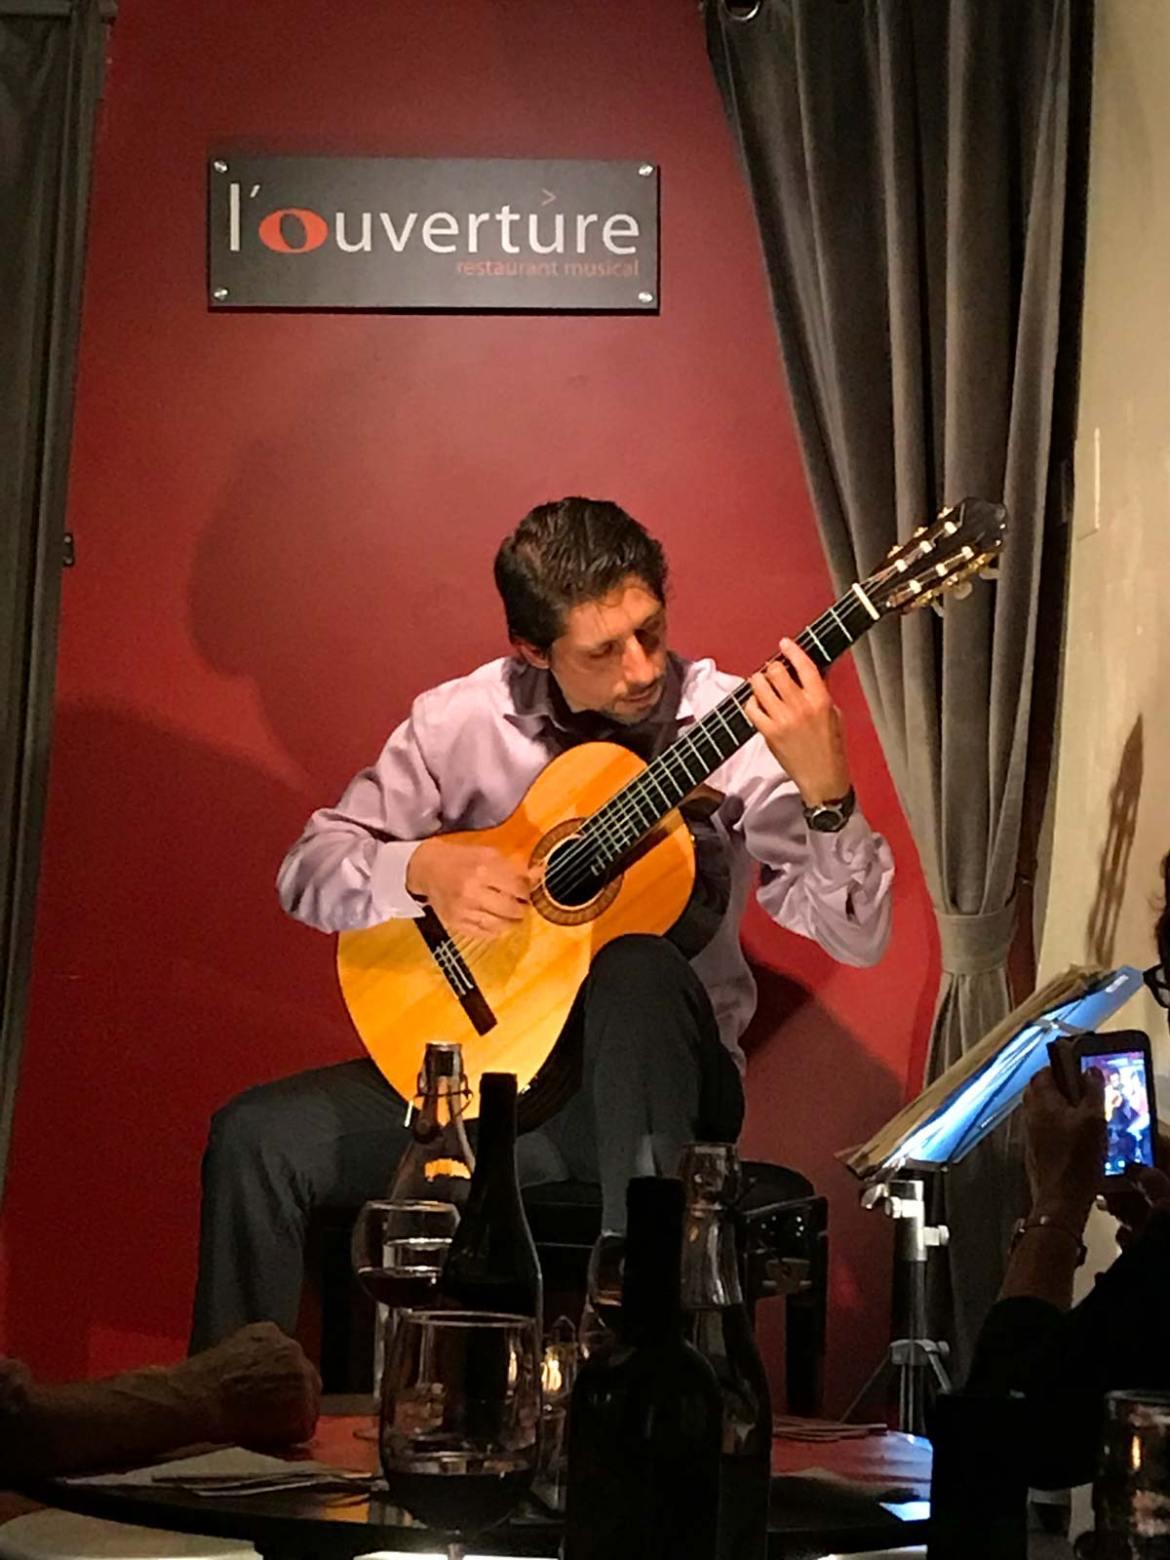 Toulouse, Frankreich, Essen, Musik, Gitarre